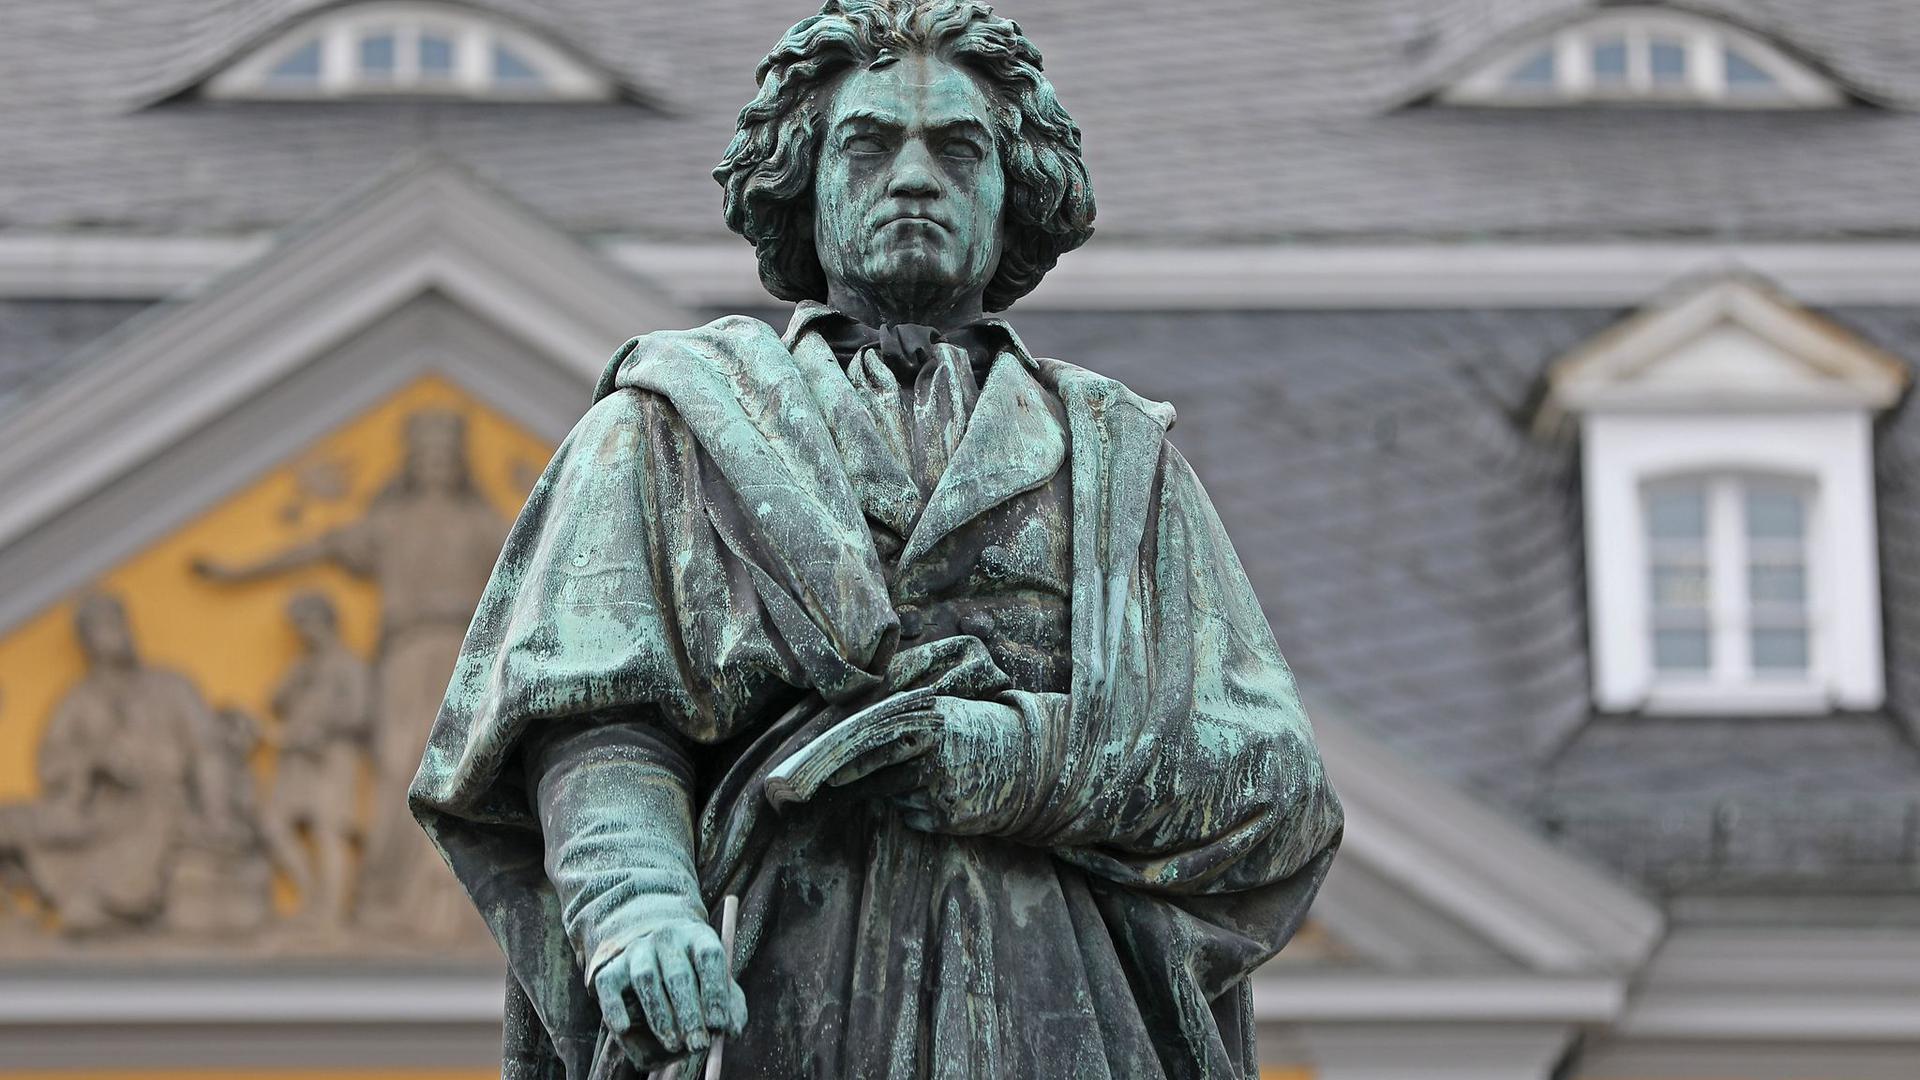 Statue des Komponisten Ludwig van Beethoven in Bonn.